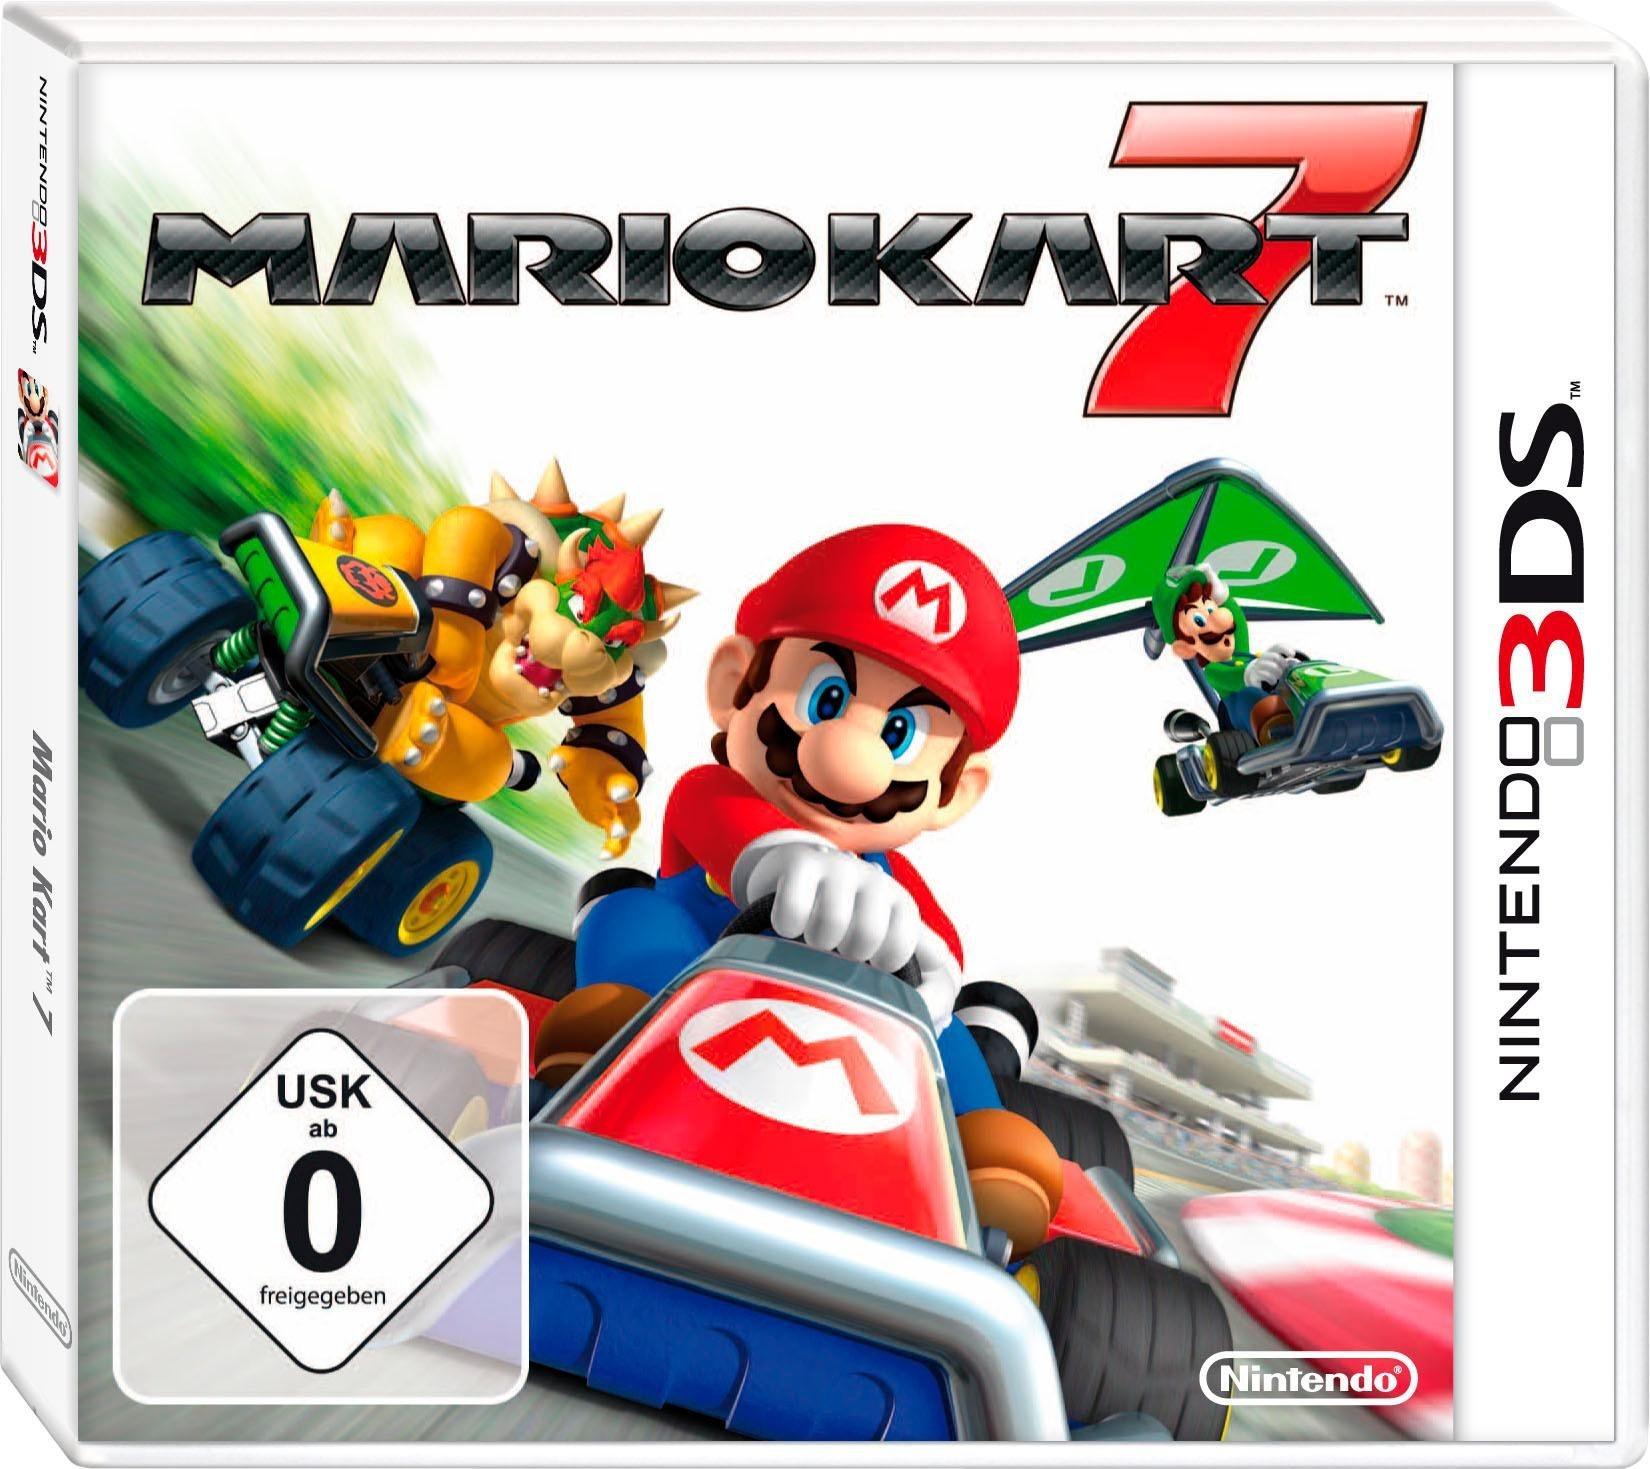 MarioKart 7